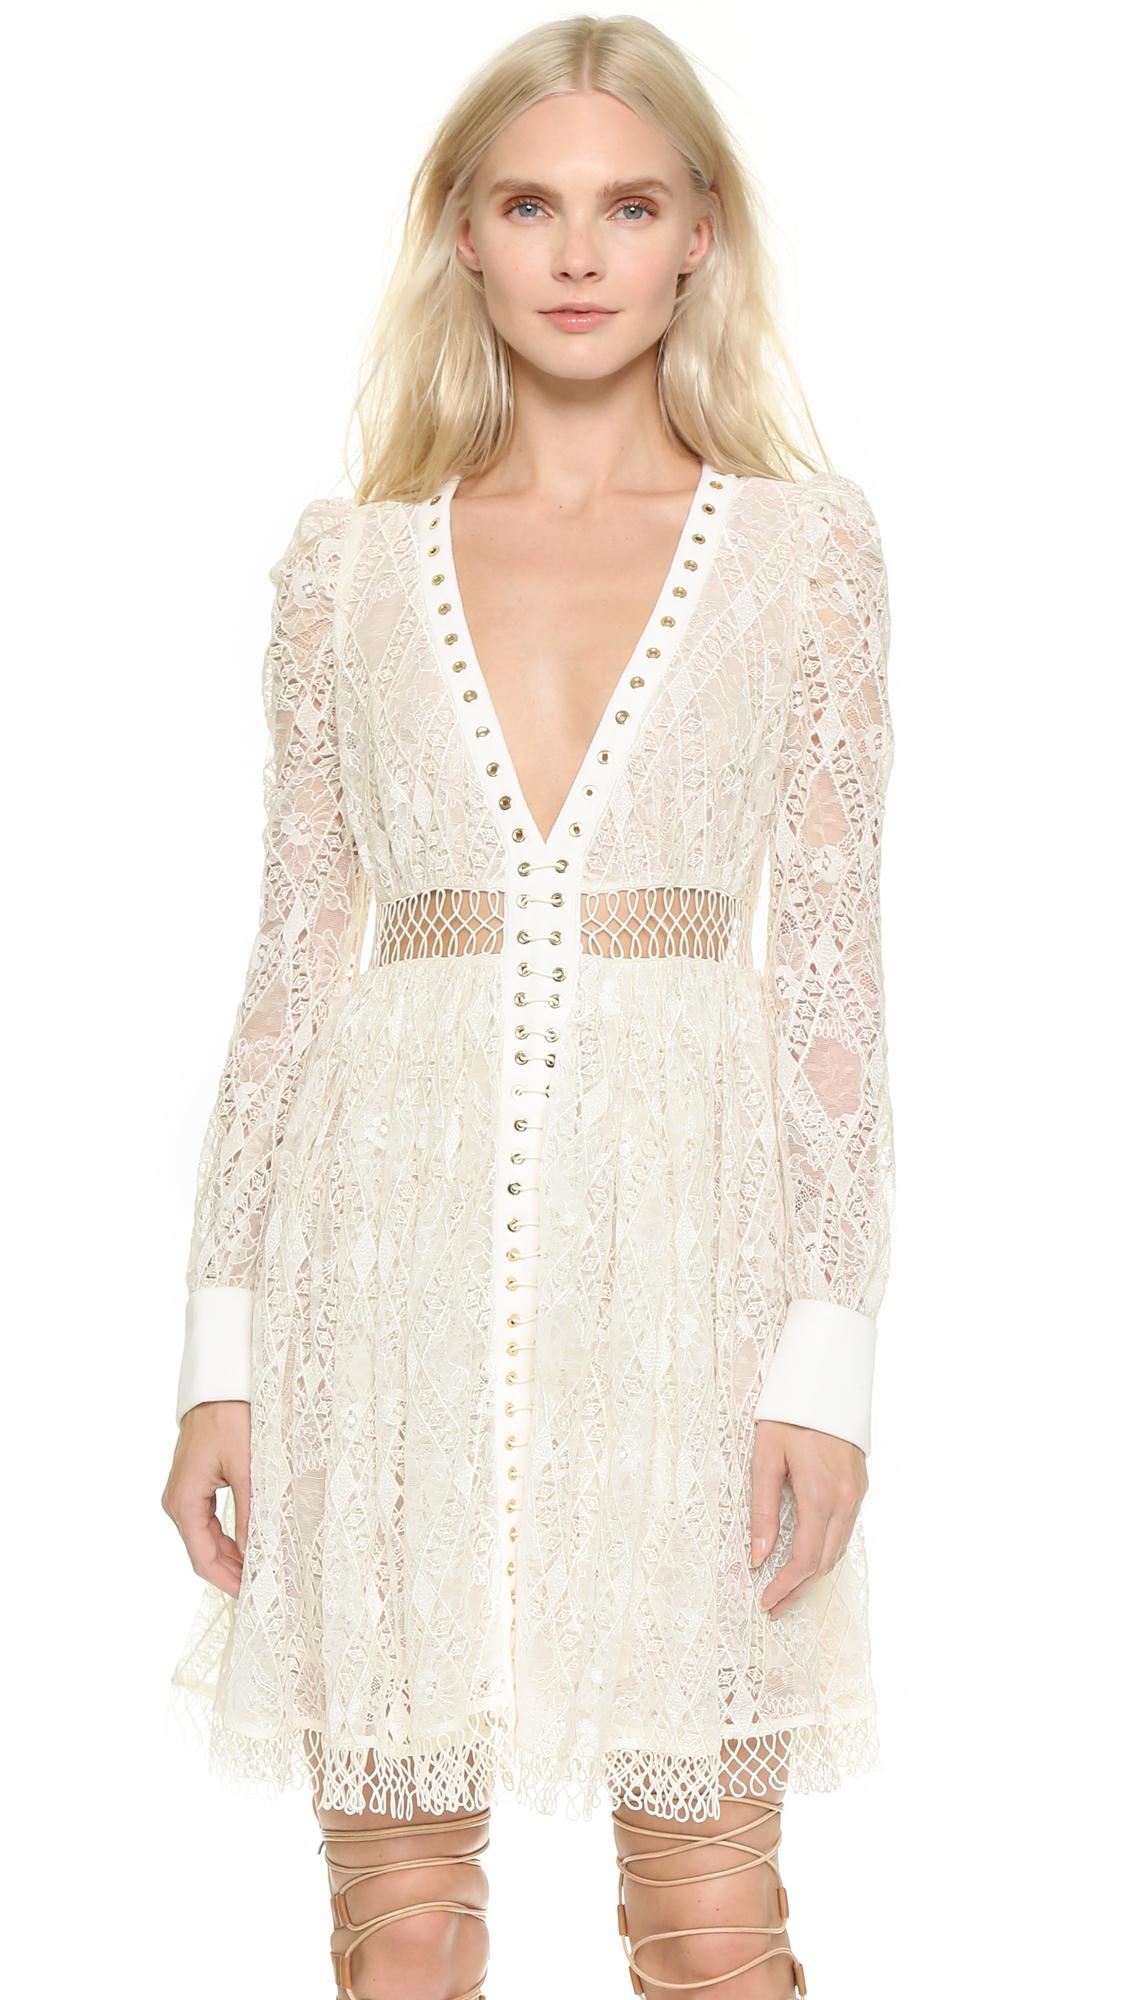 Size plus sequin dress australia, Princess disney wedding dresses ariel